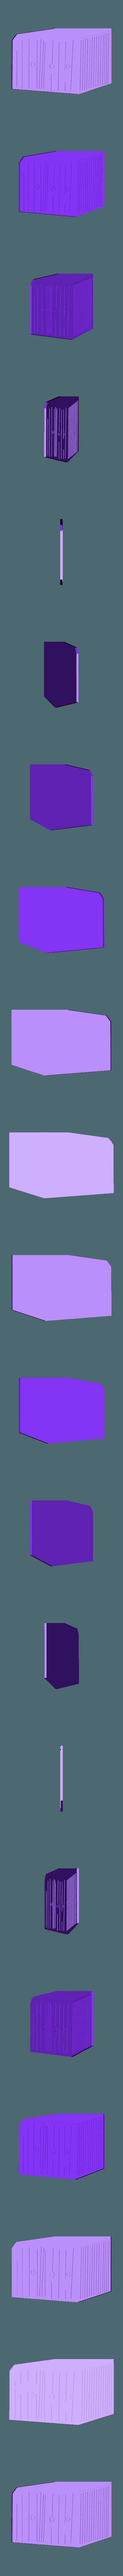 Table.stl Download free STL file Metaphor • 3D printing template, JayOmega